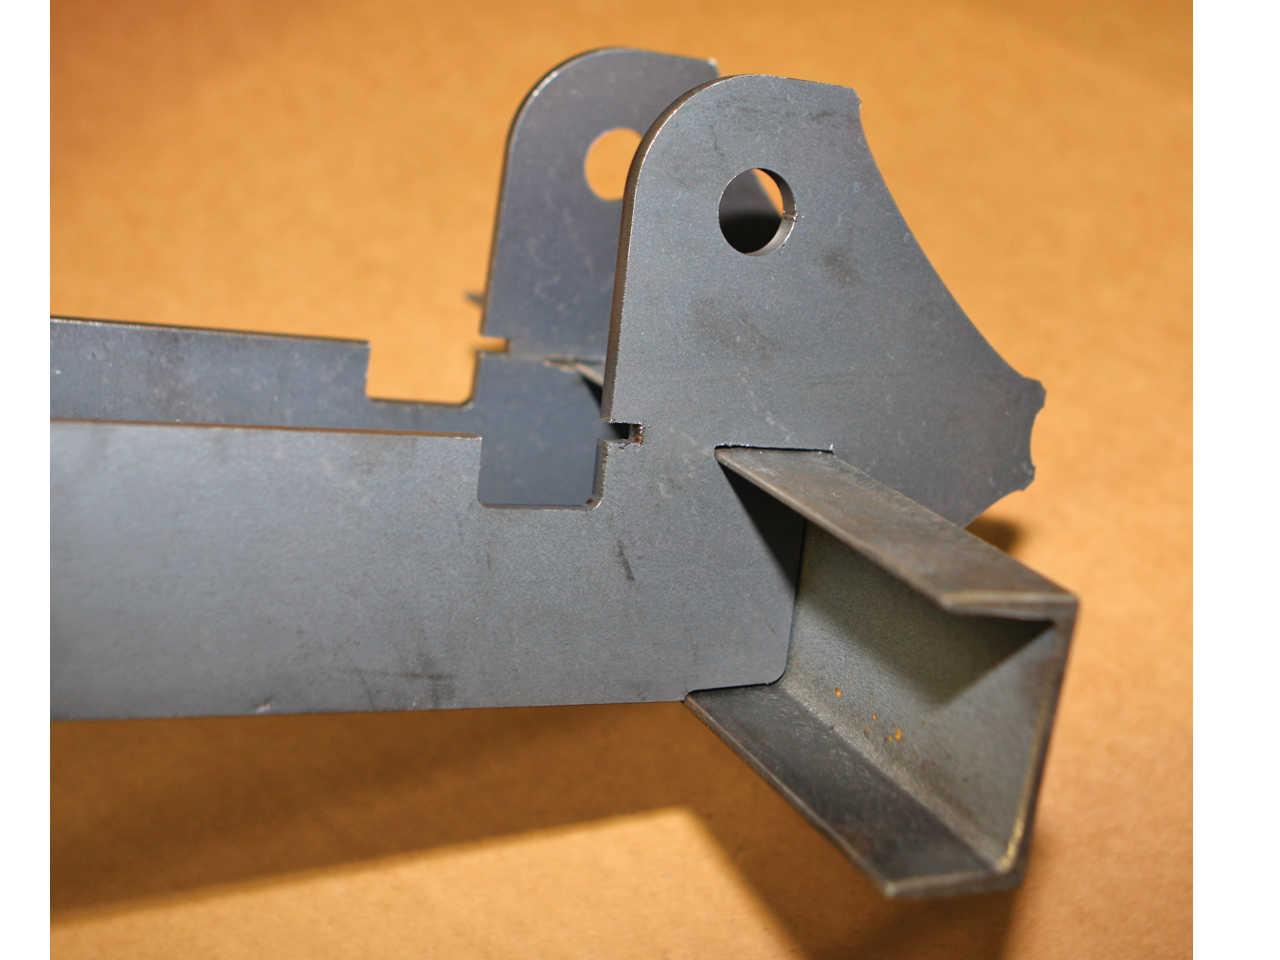 New Shop Tool The Rogue Engineering Tube Bender Atv